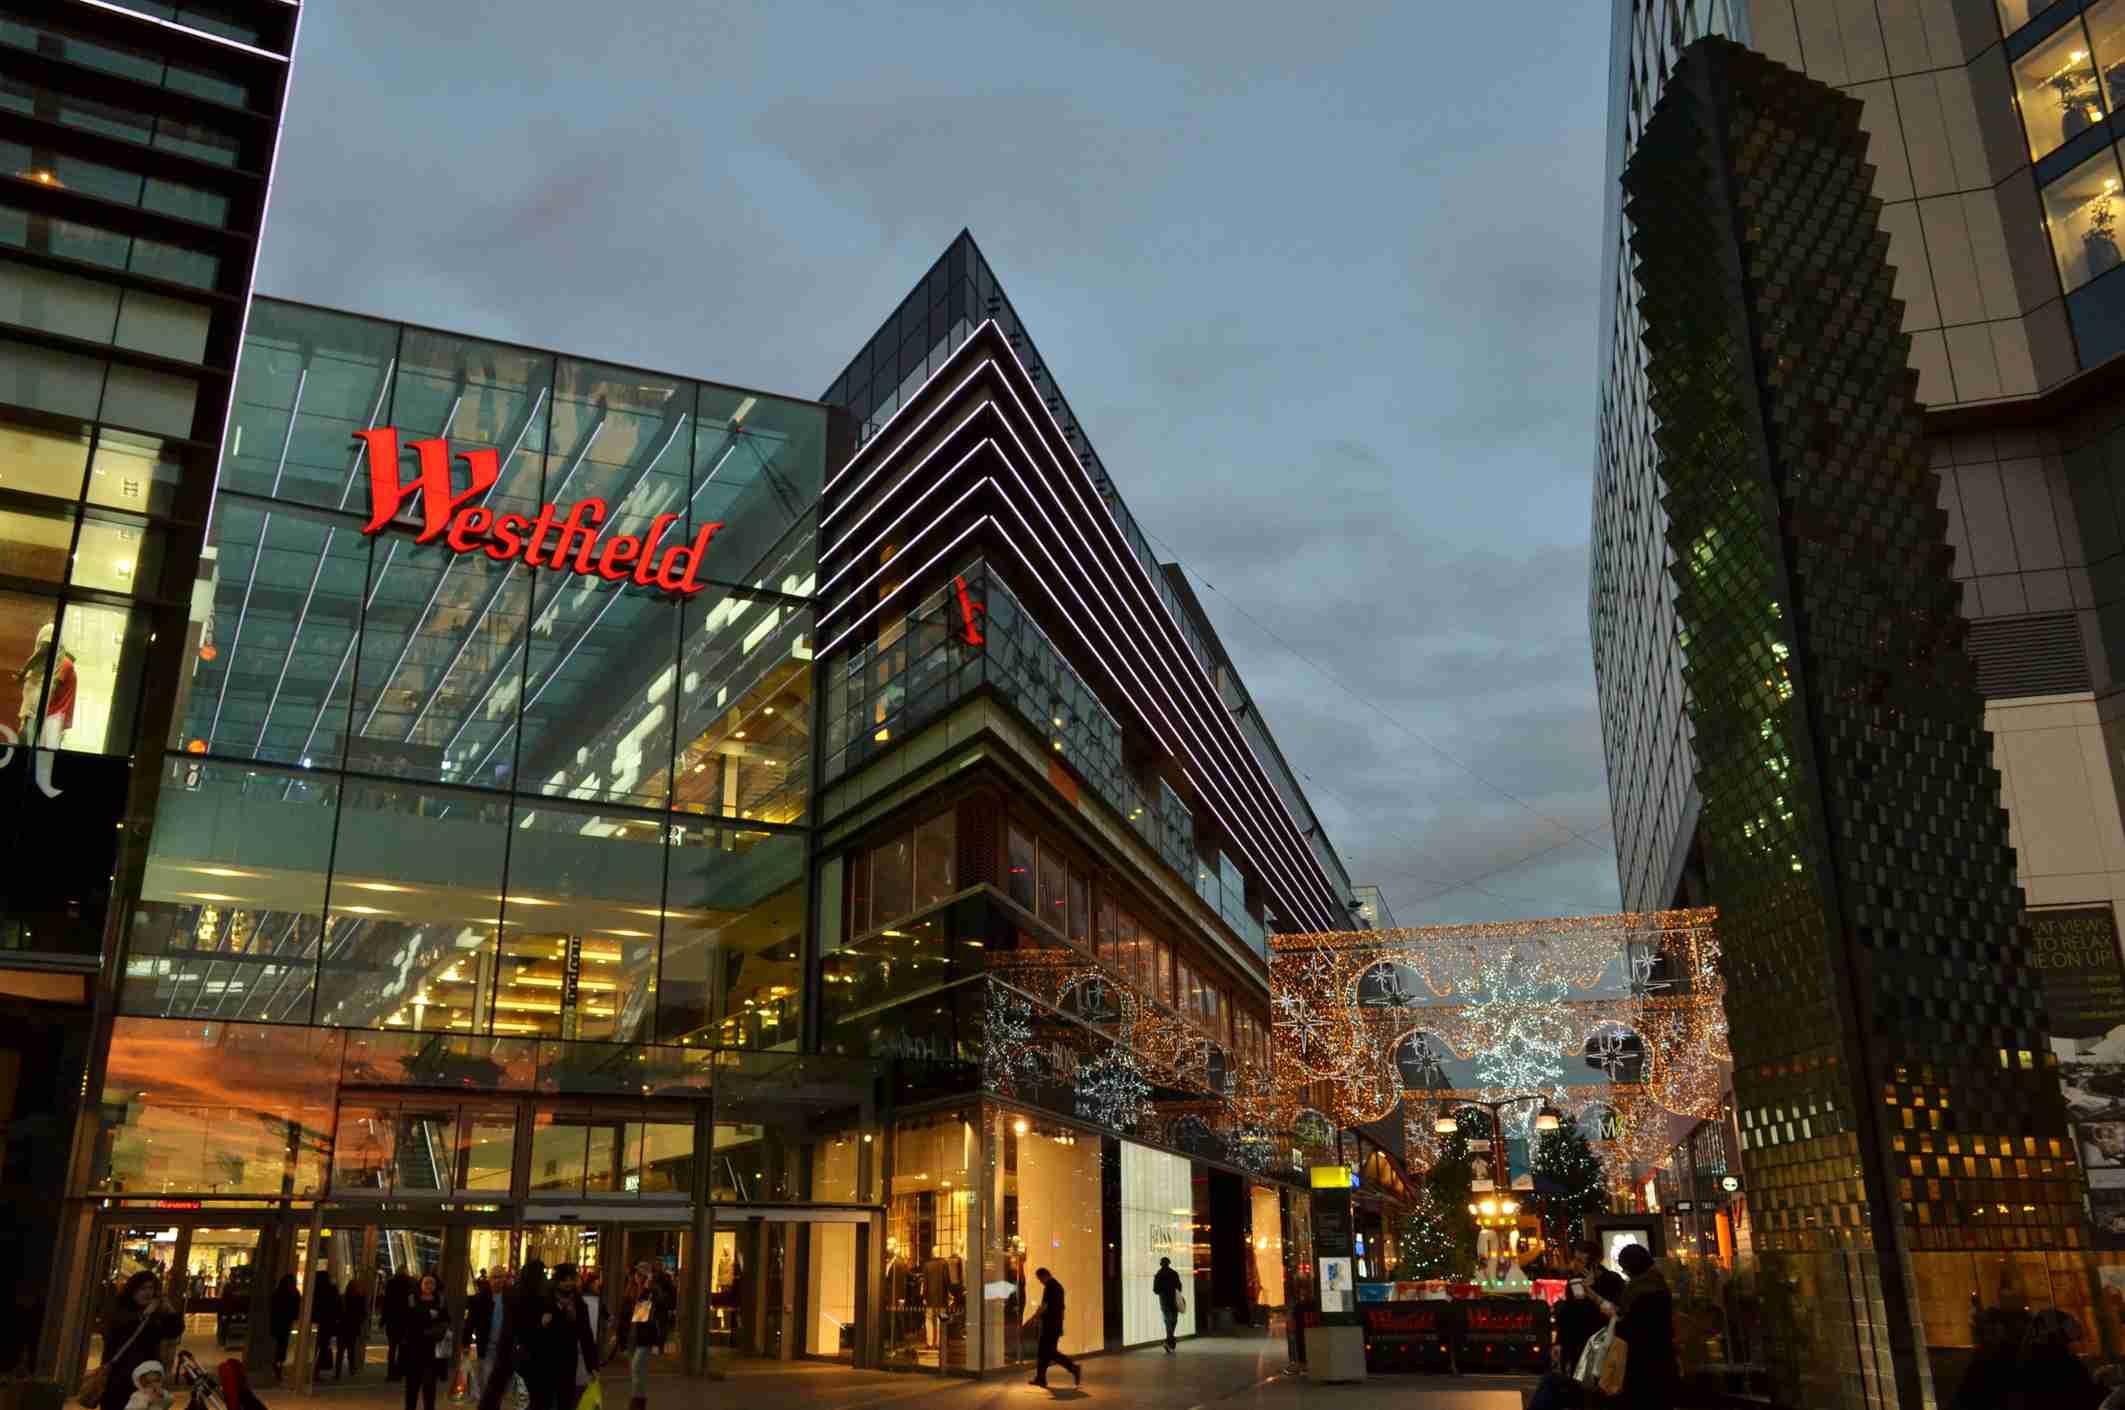 Westfield Stratford City shopping center, London